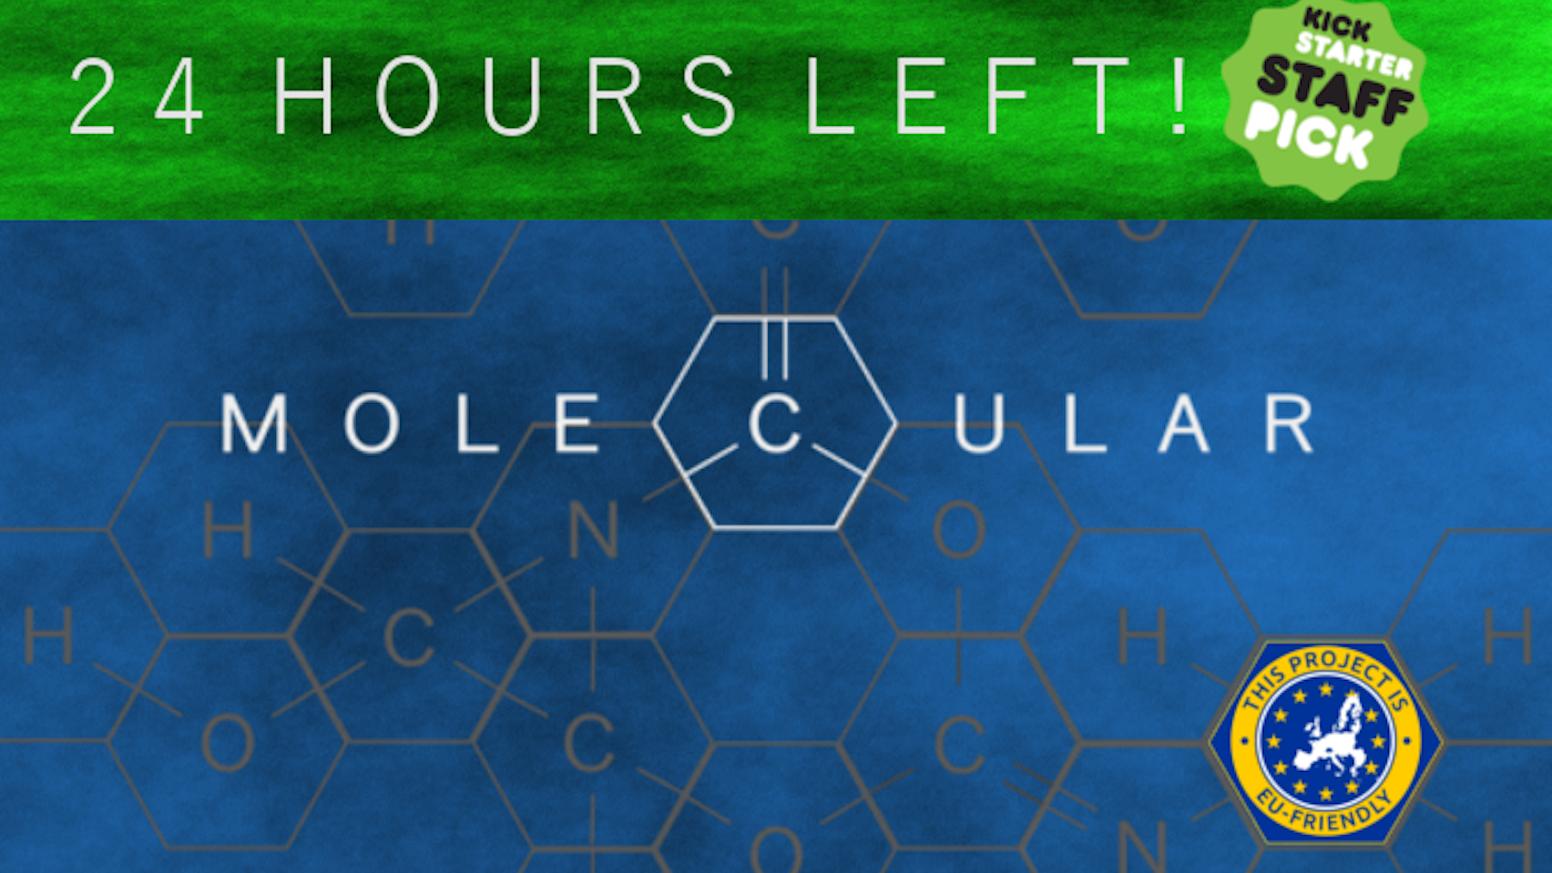 Molecular The Strategic Chemistry Tile Game By Inside